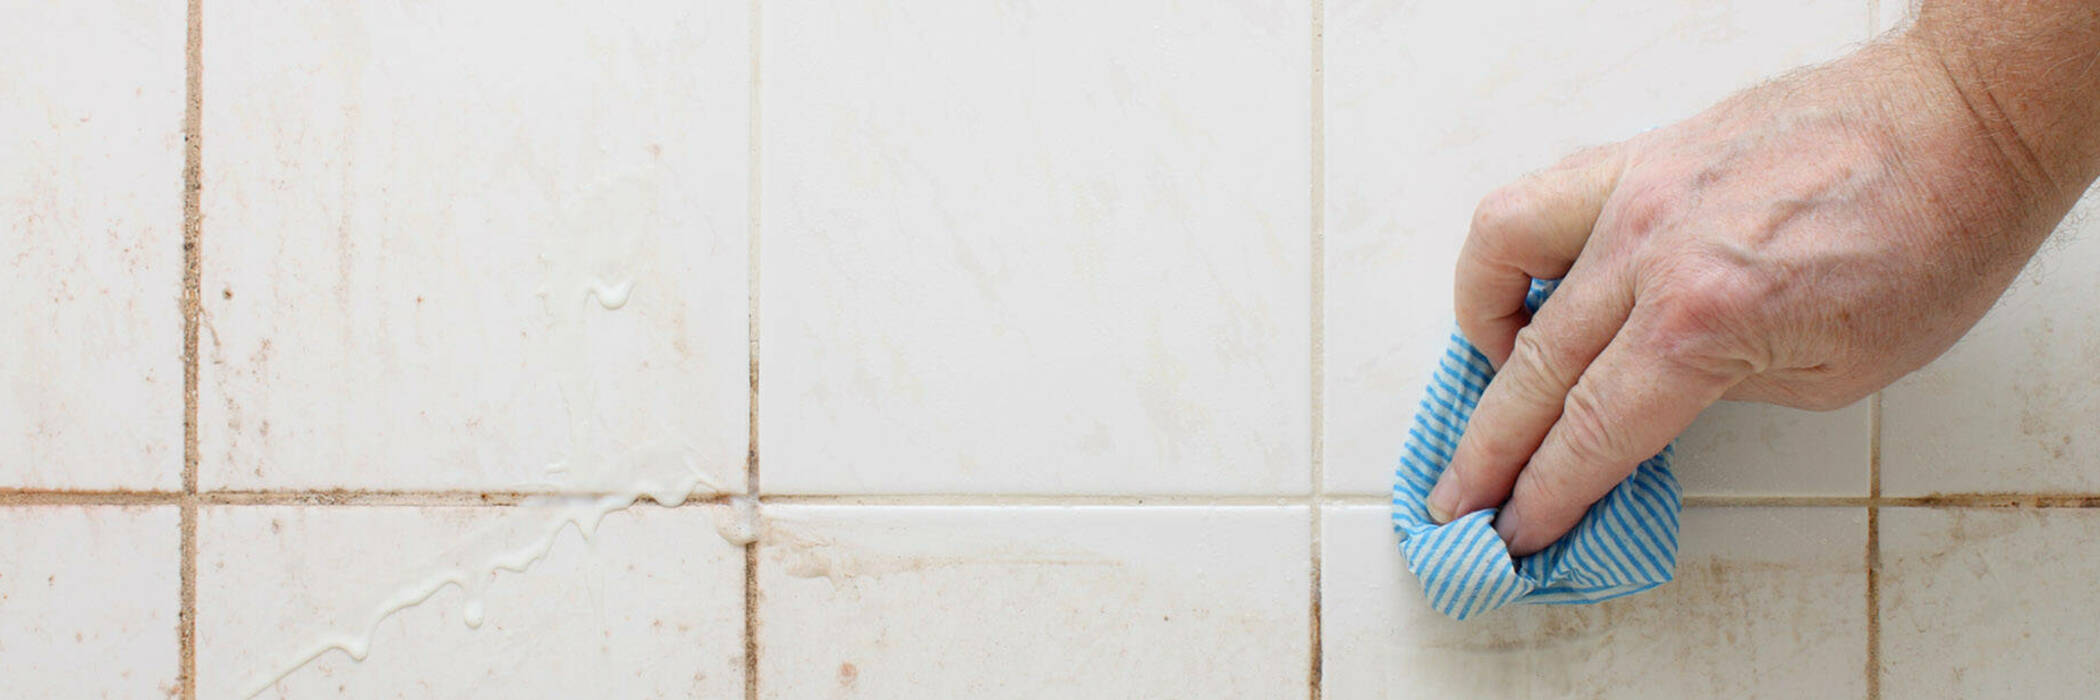 wiping dirty bathroom tiles